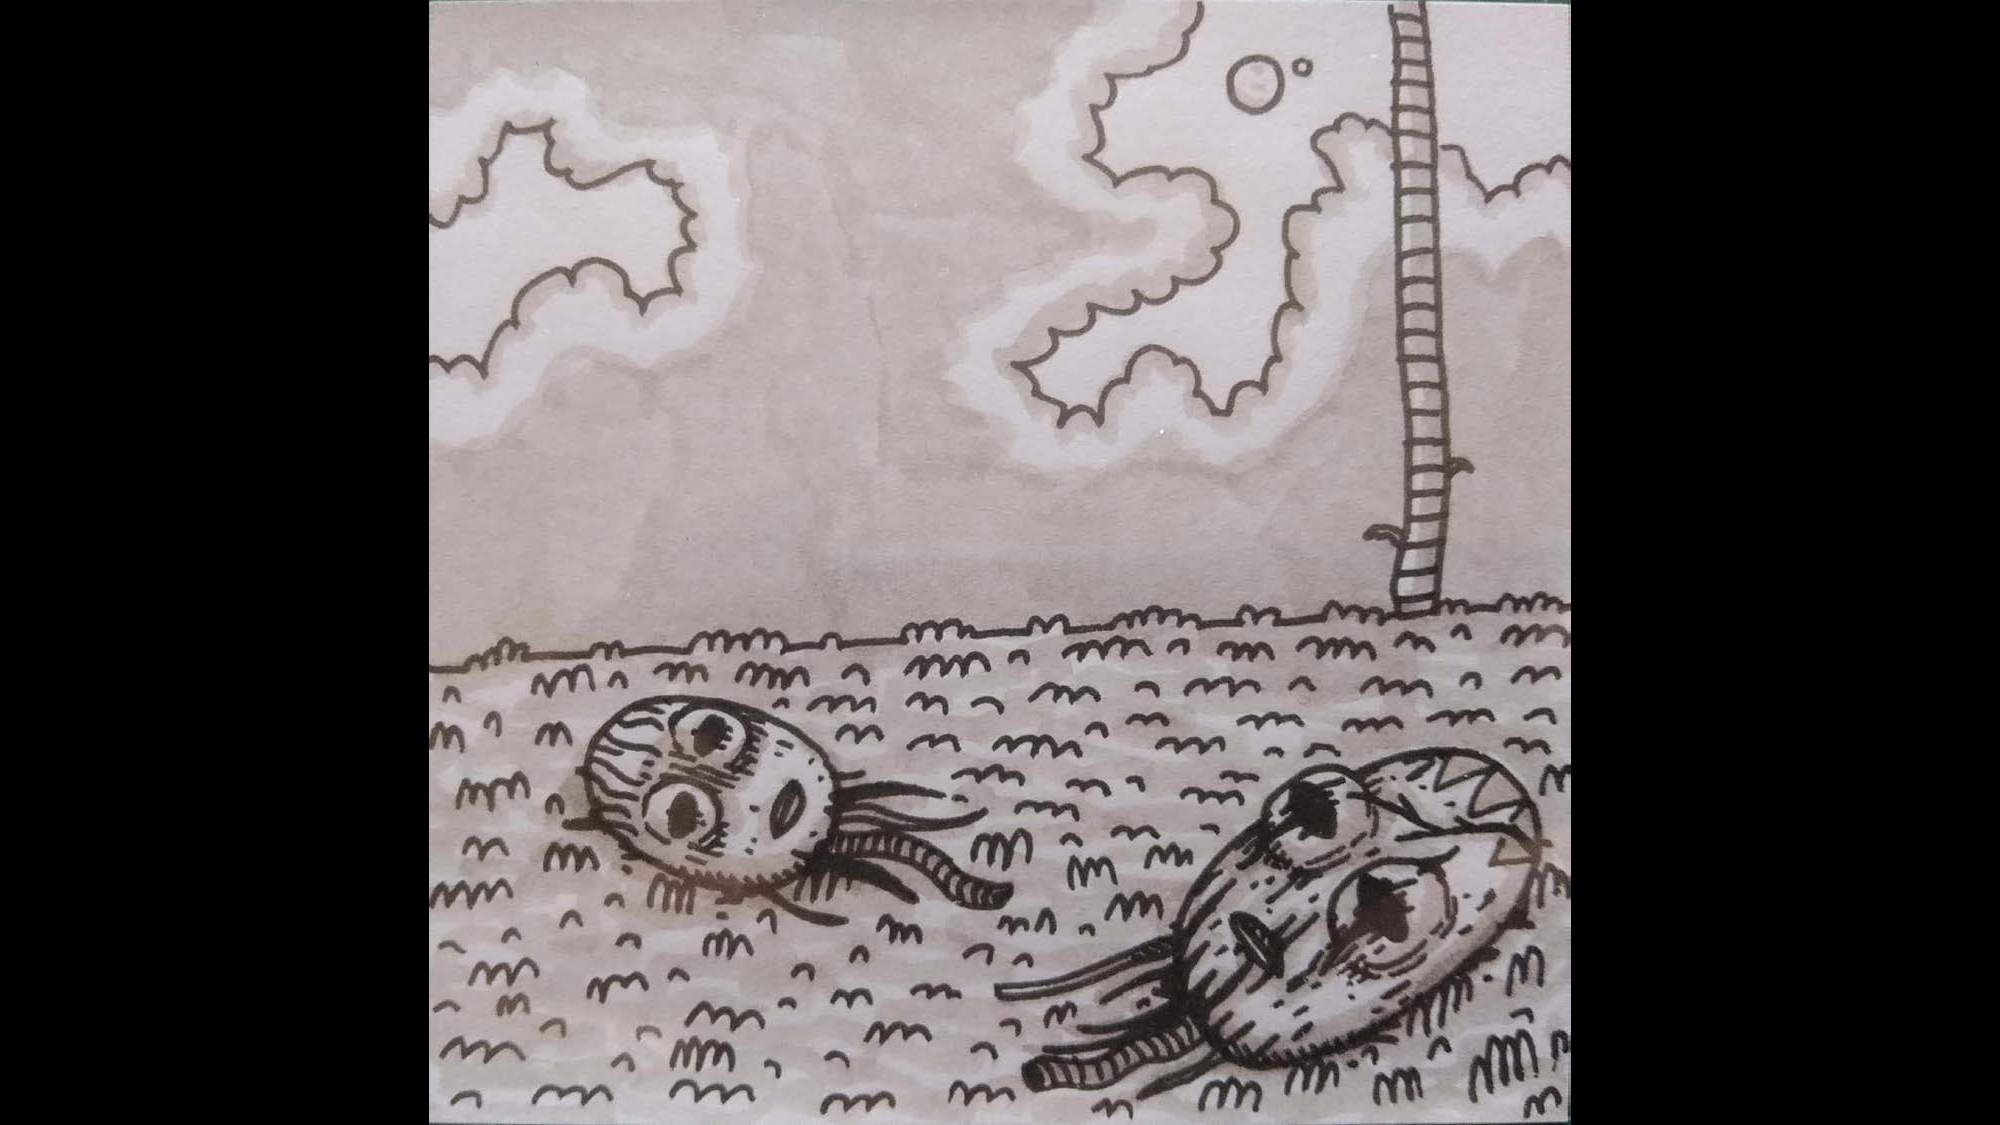 CÓMIC Mateo Zorrilla Lara_page-0062